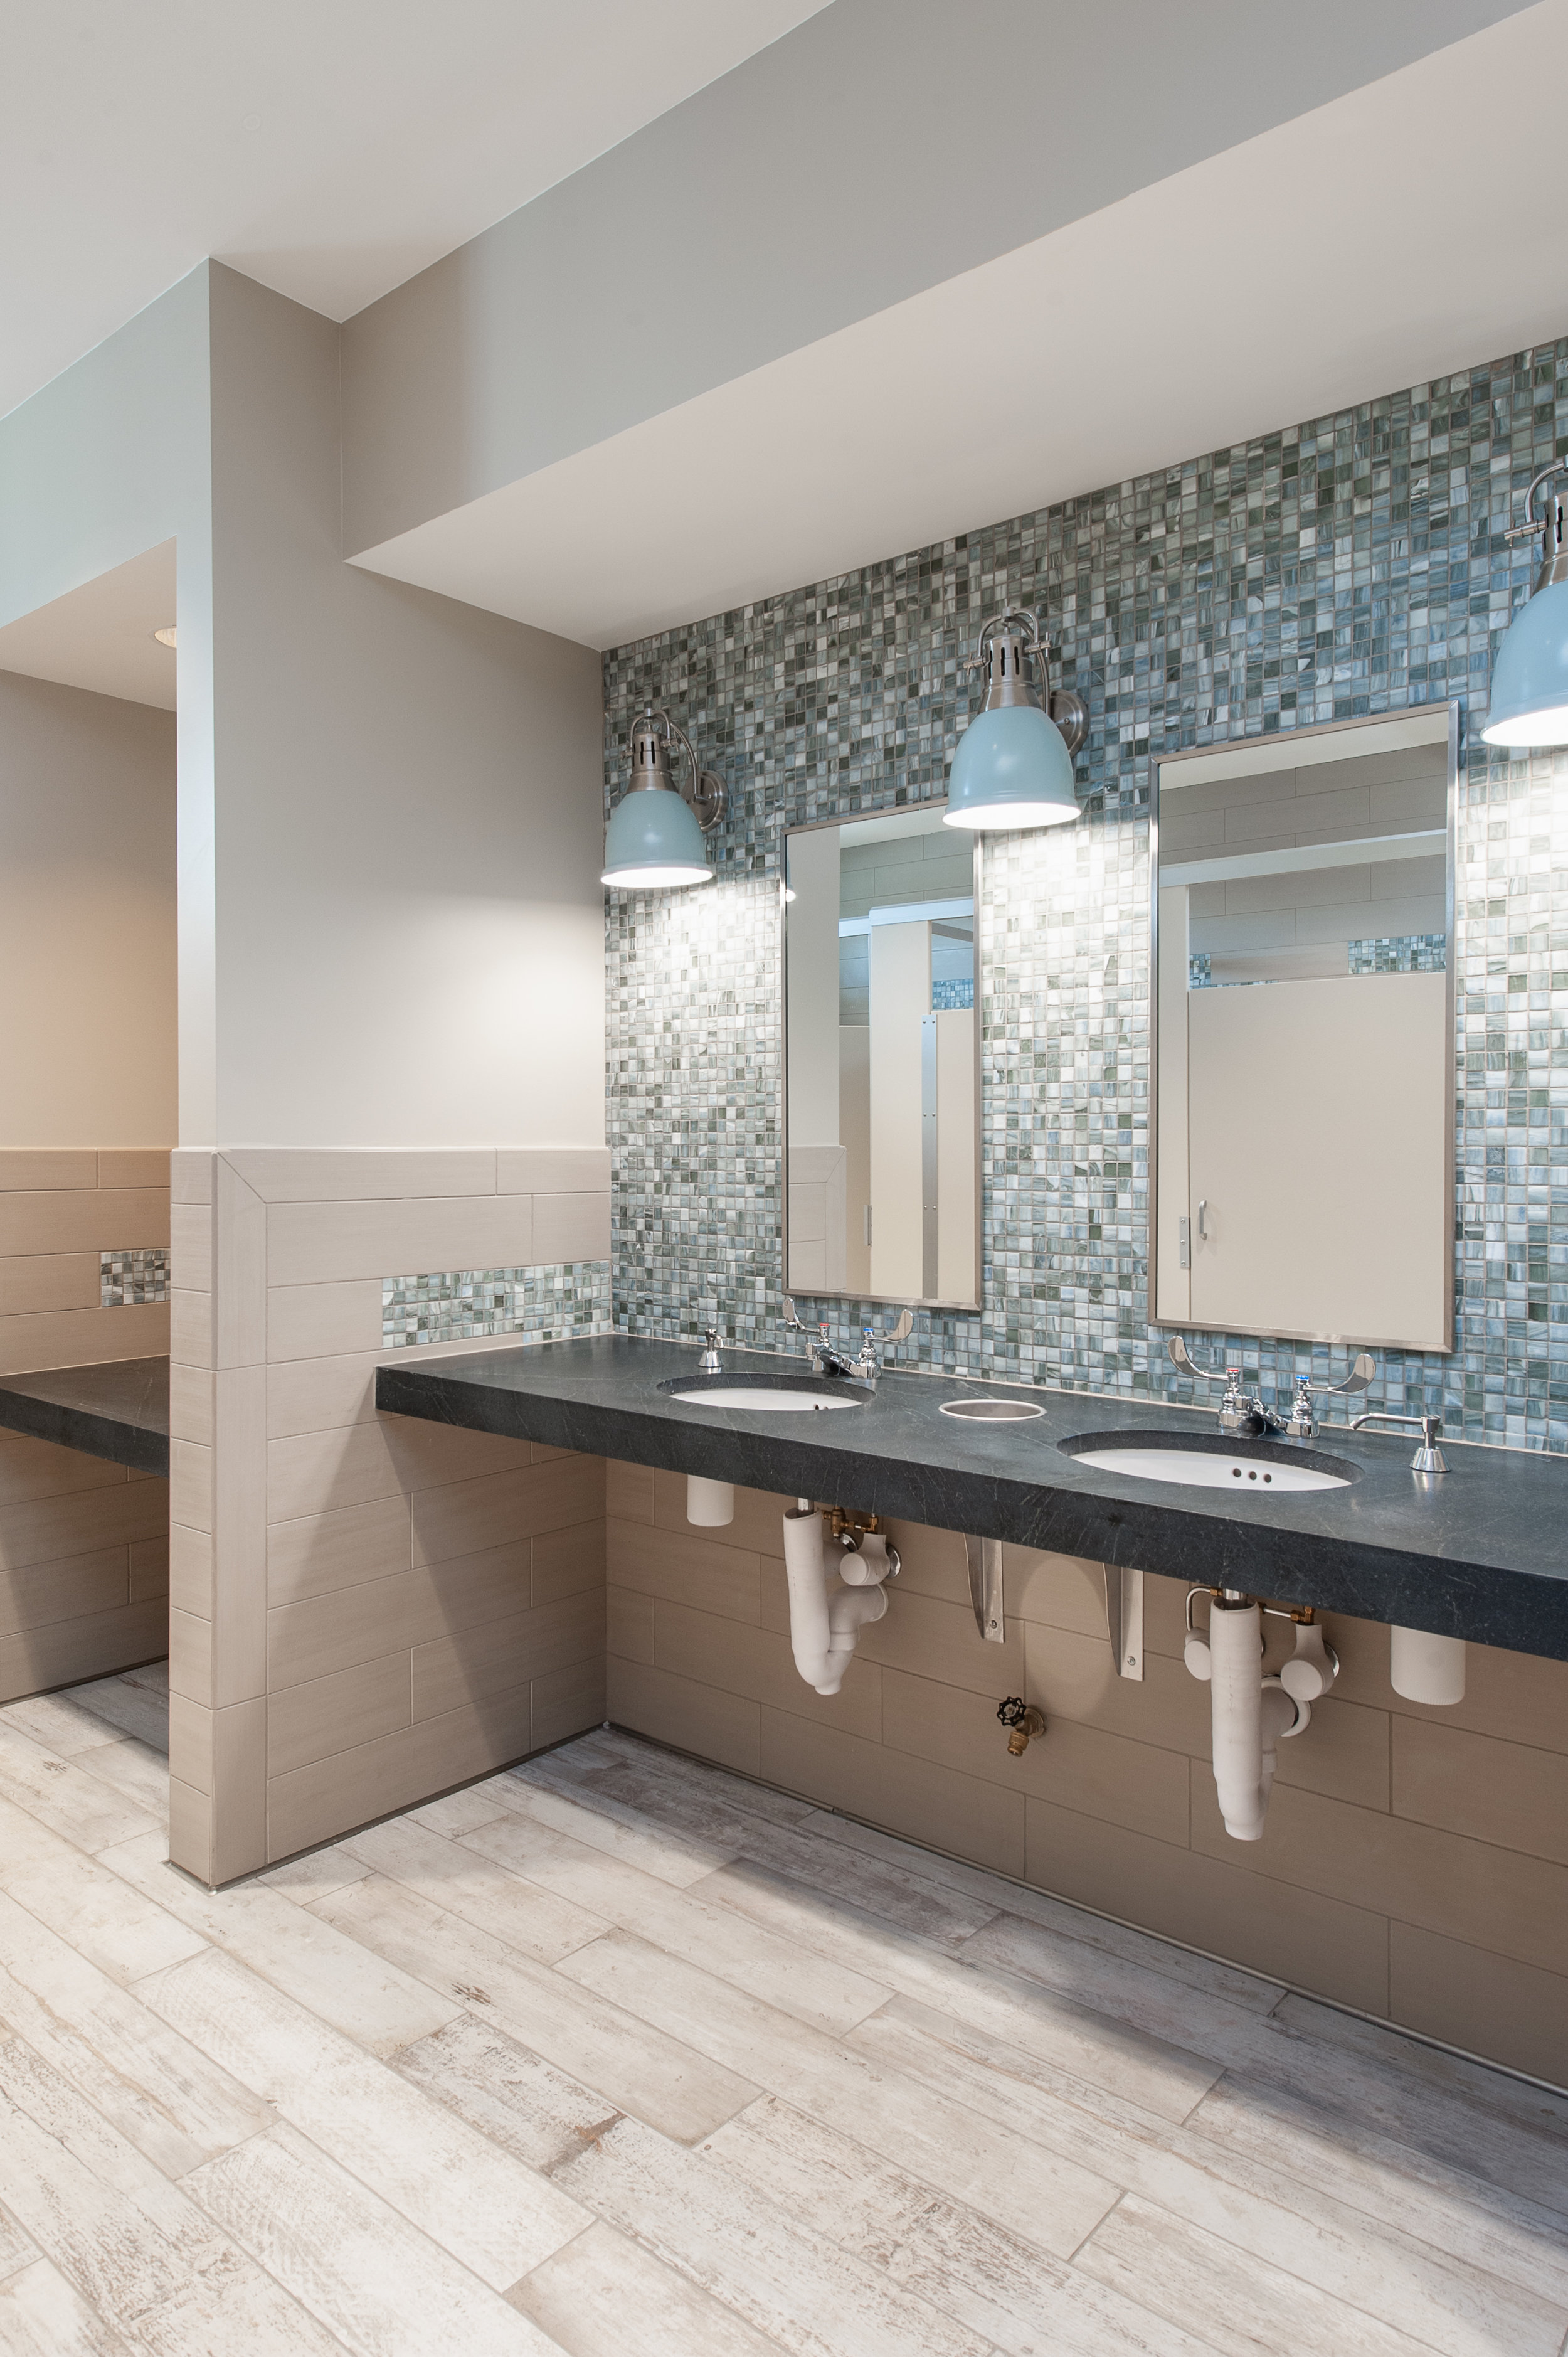 Micamy Design Studio_Interior Design_Beacon Lake_Amenity Center_Clubhouse_New England Style_Nautical_Glass_Mosaic_Tile_Sconce Restroom_Soapstone_Lantern_Wallpaper_Blue_.jpg